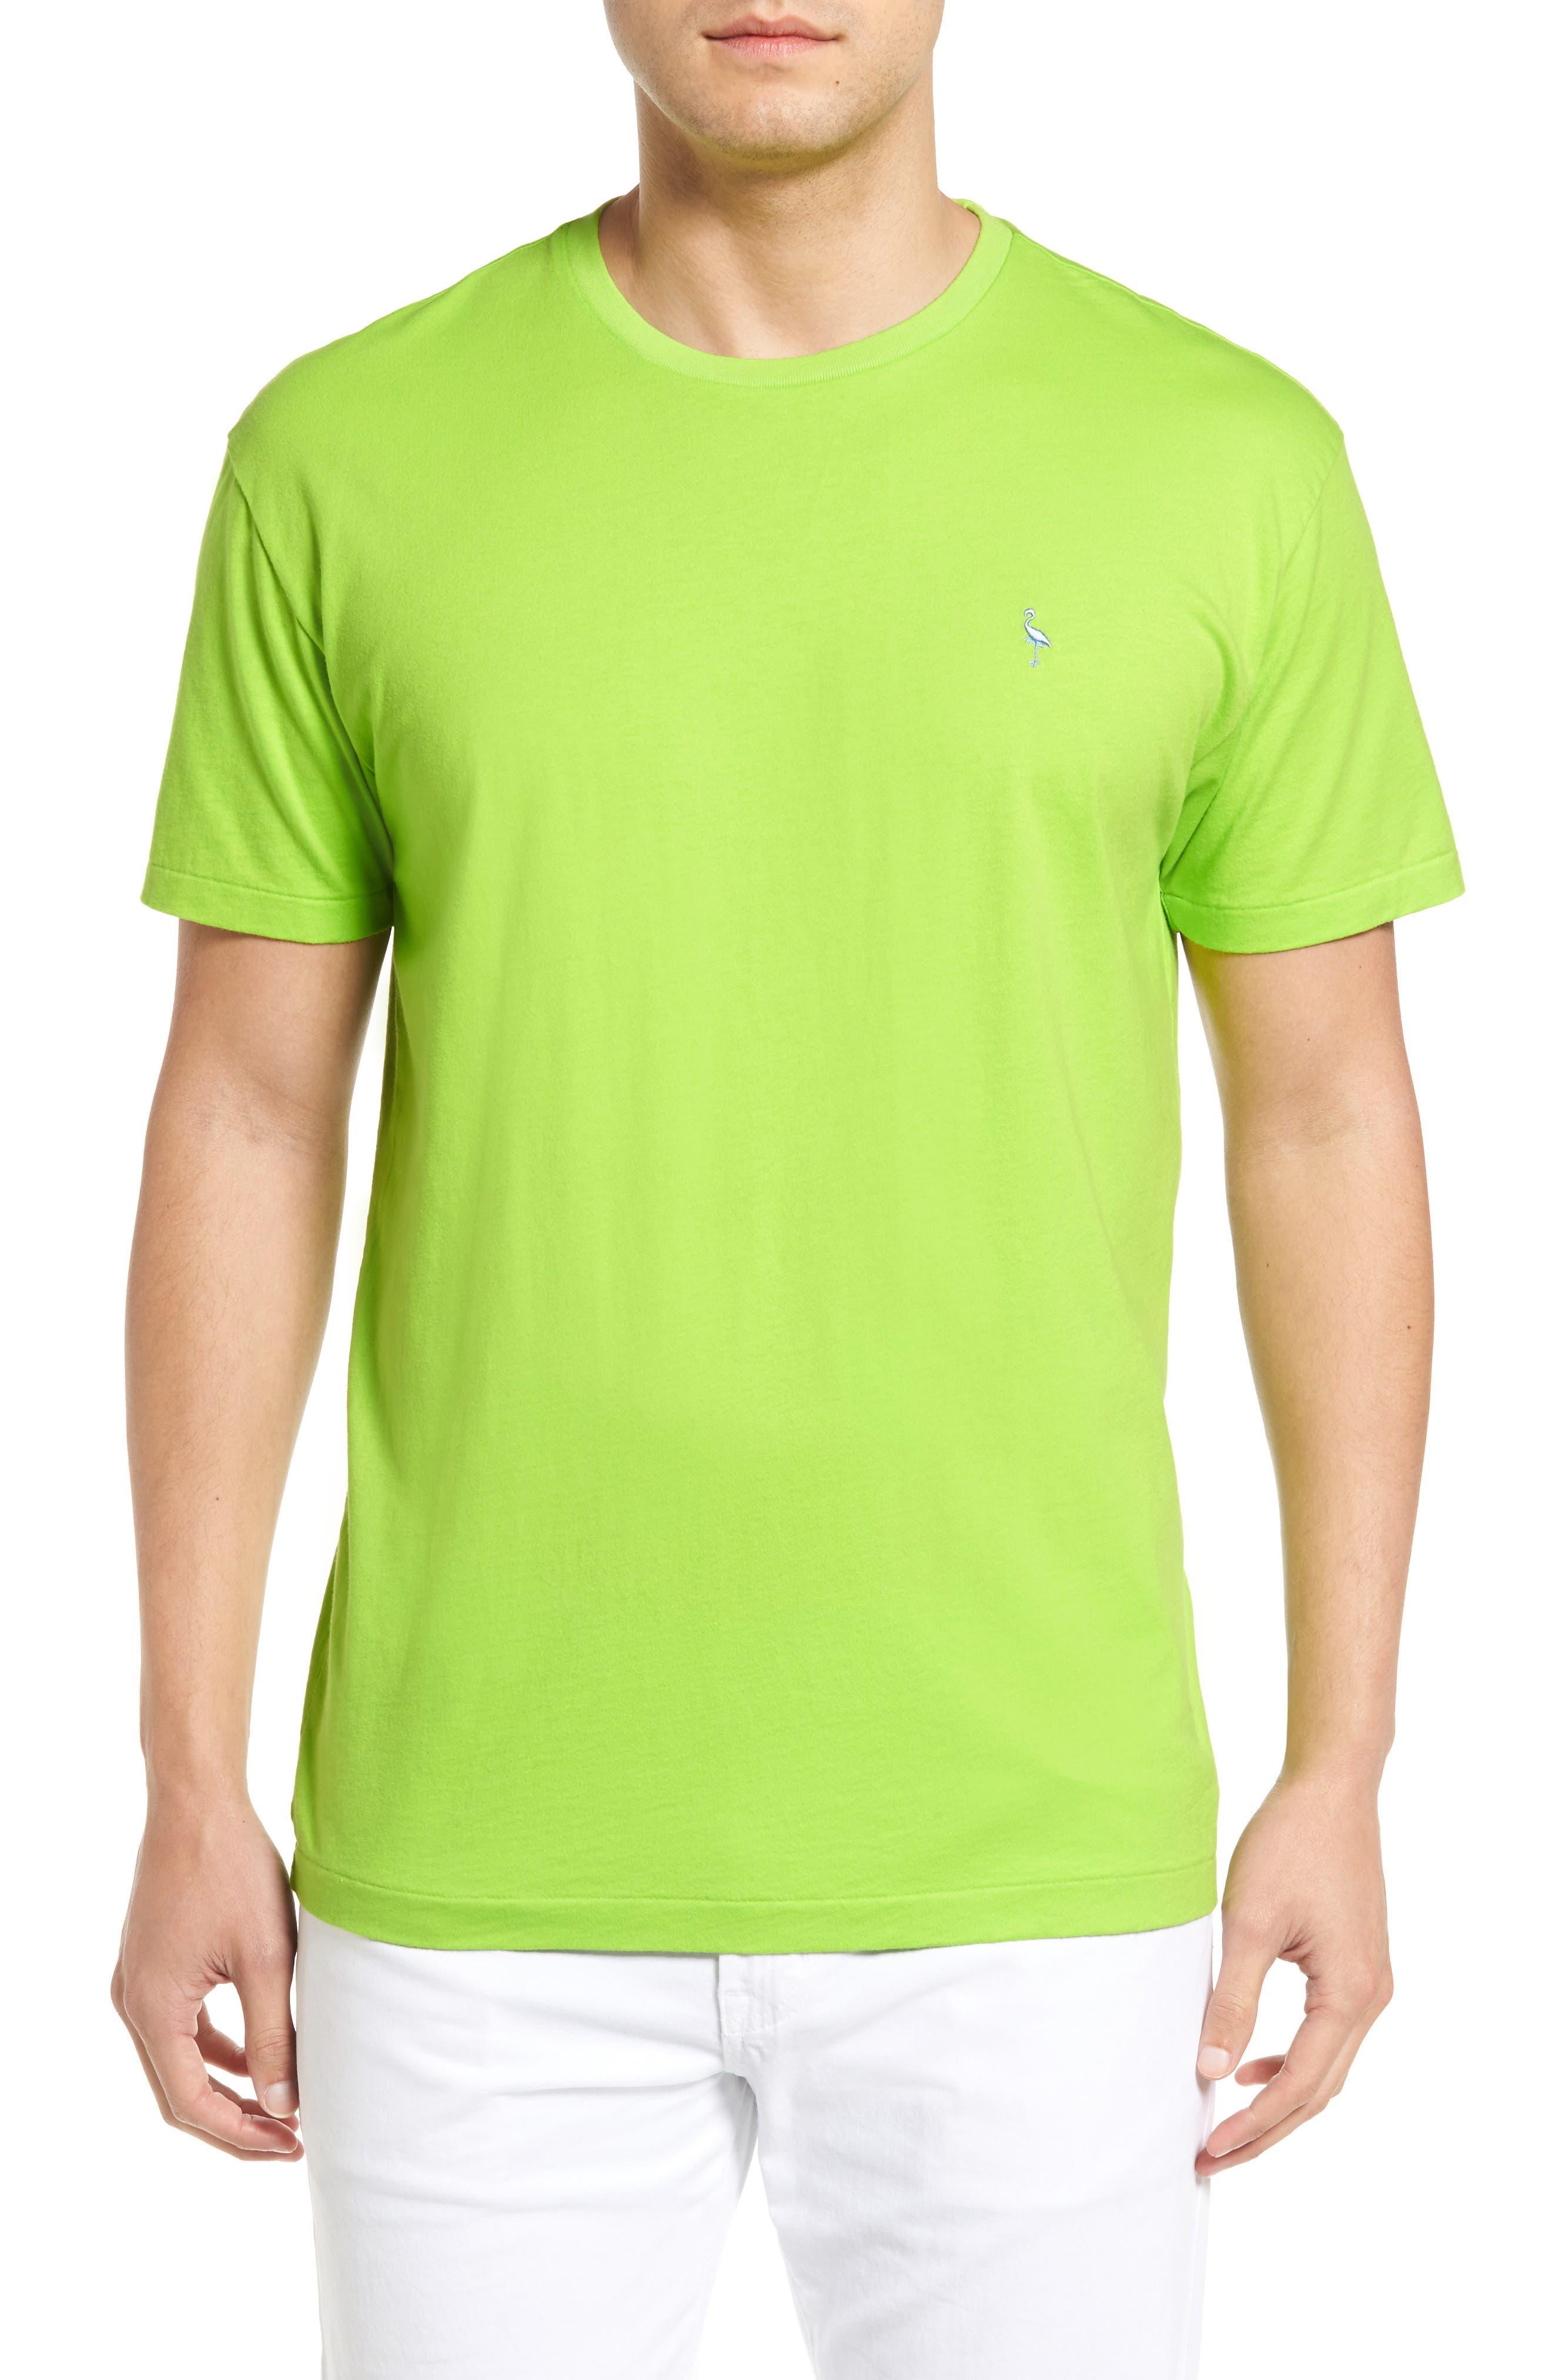 TailorByrd Markham Square T-Shirt